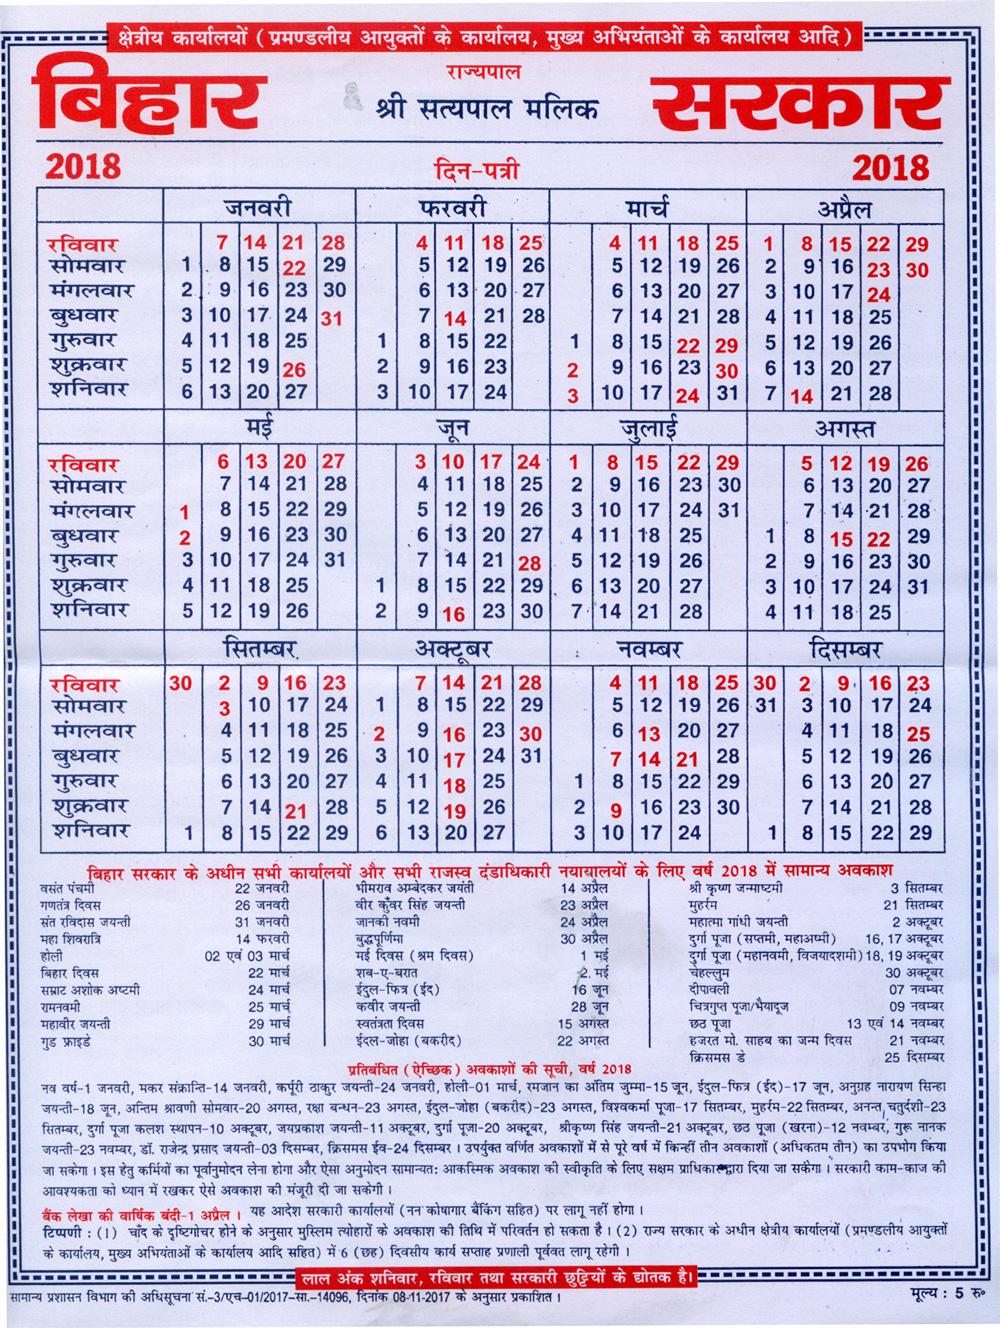 Bihar Govt. Calendar 2018, Bihar Govt. Holiday List, Holiday within Bihar Goverment Calender 2020